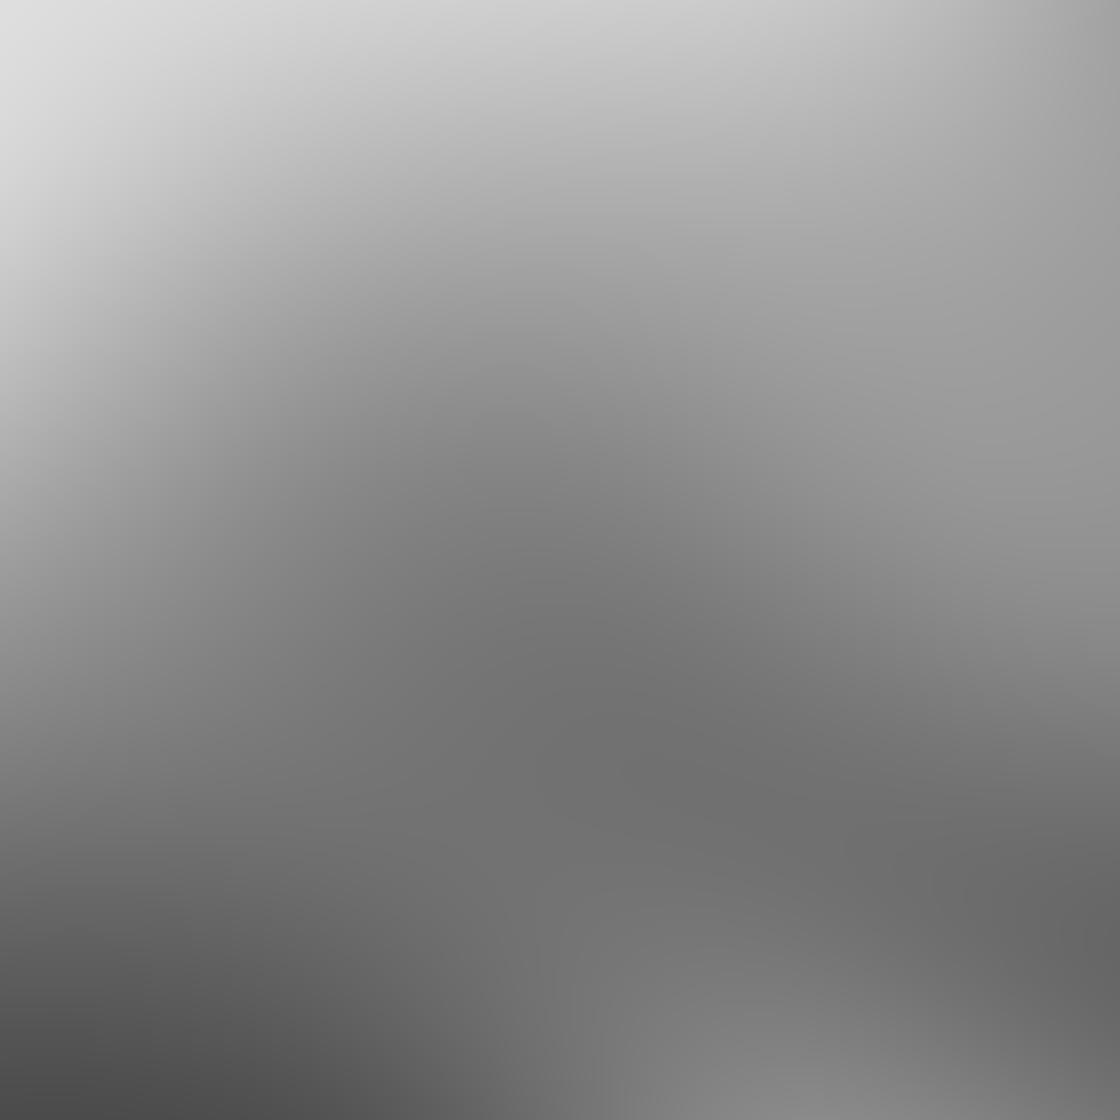 iPhone Photo Shadows 8